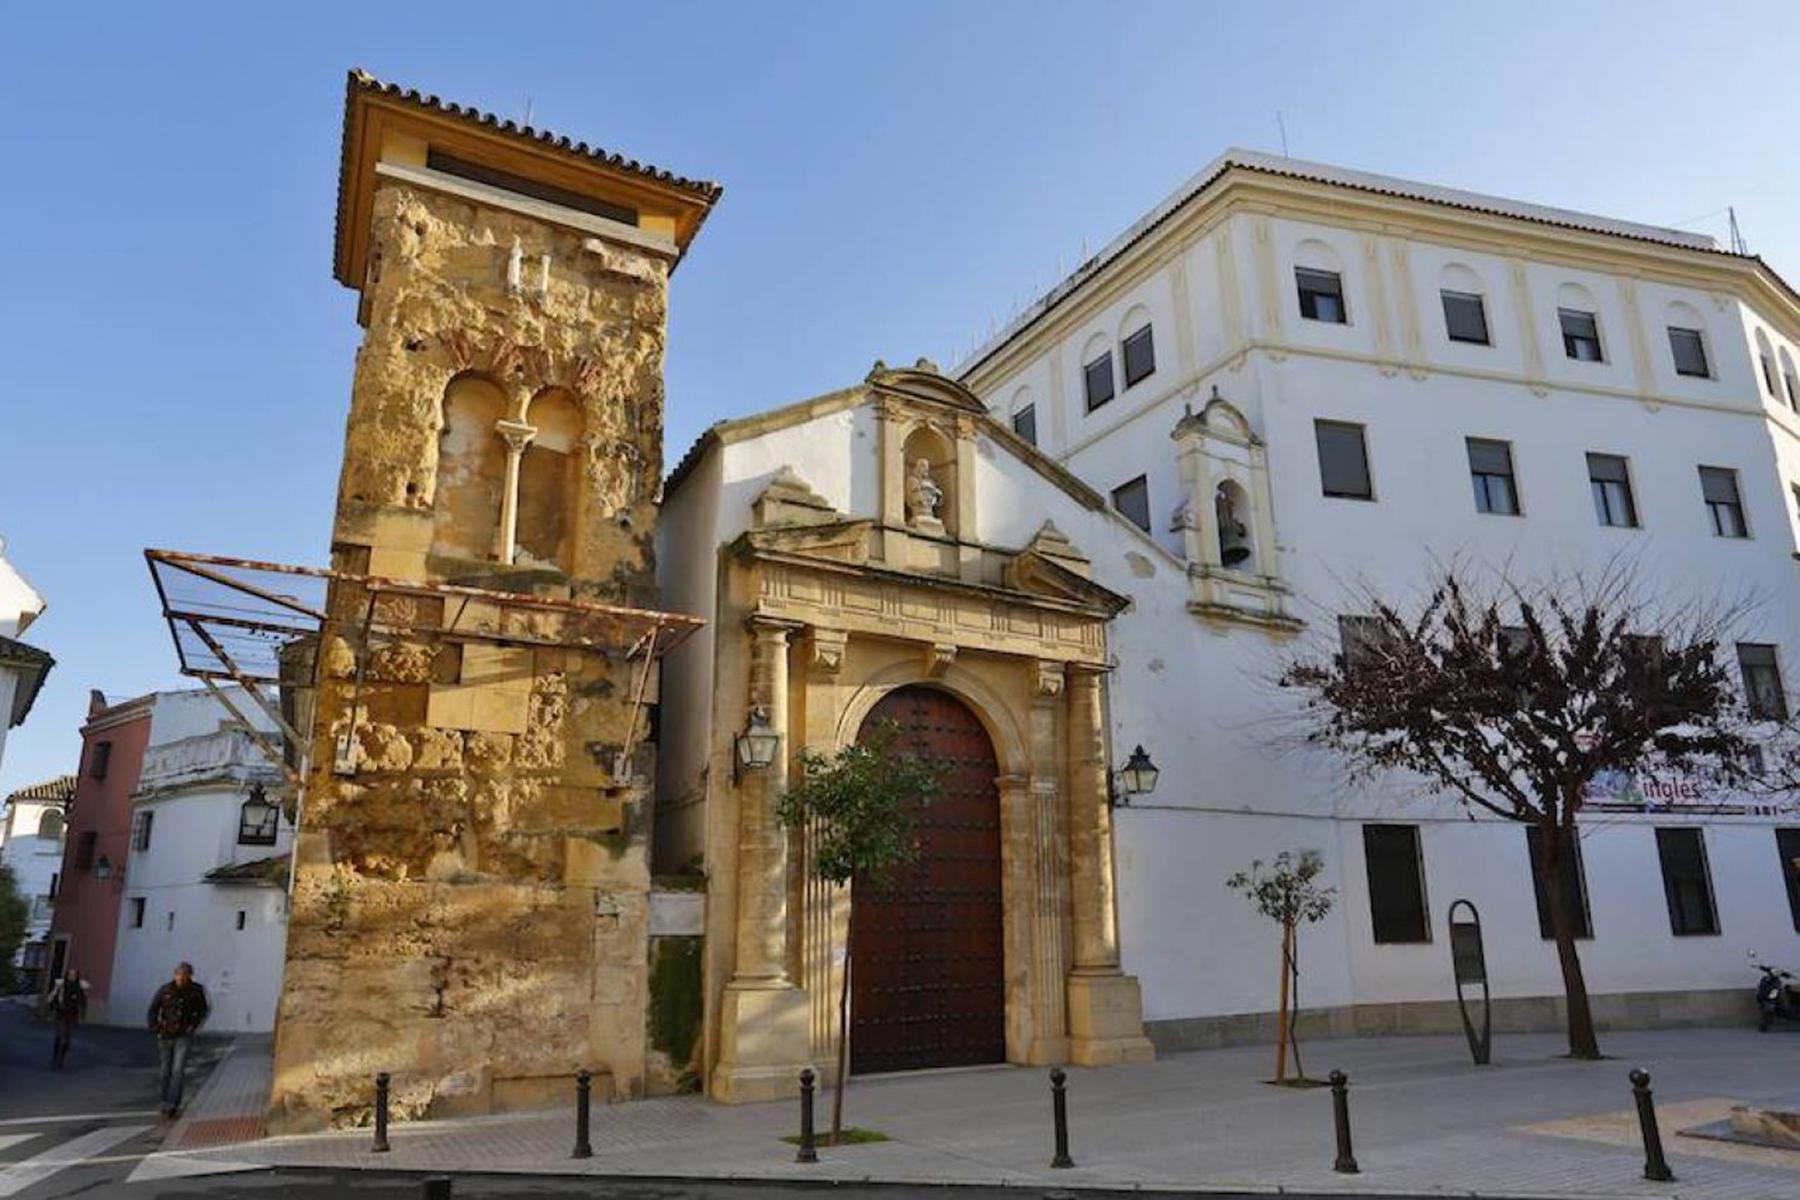 Maison unifamiliale pour l Vente à villa in Old town of Cordoba Cordoba, Andalousie, 14001 Espagne